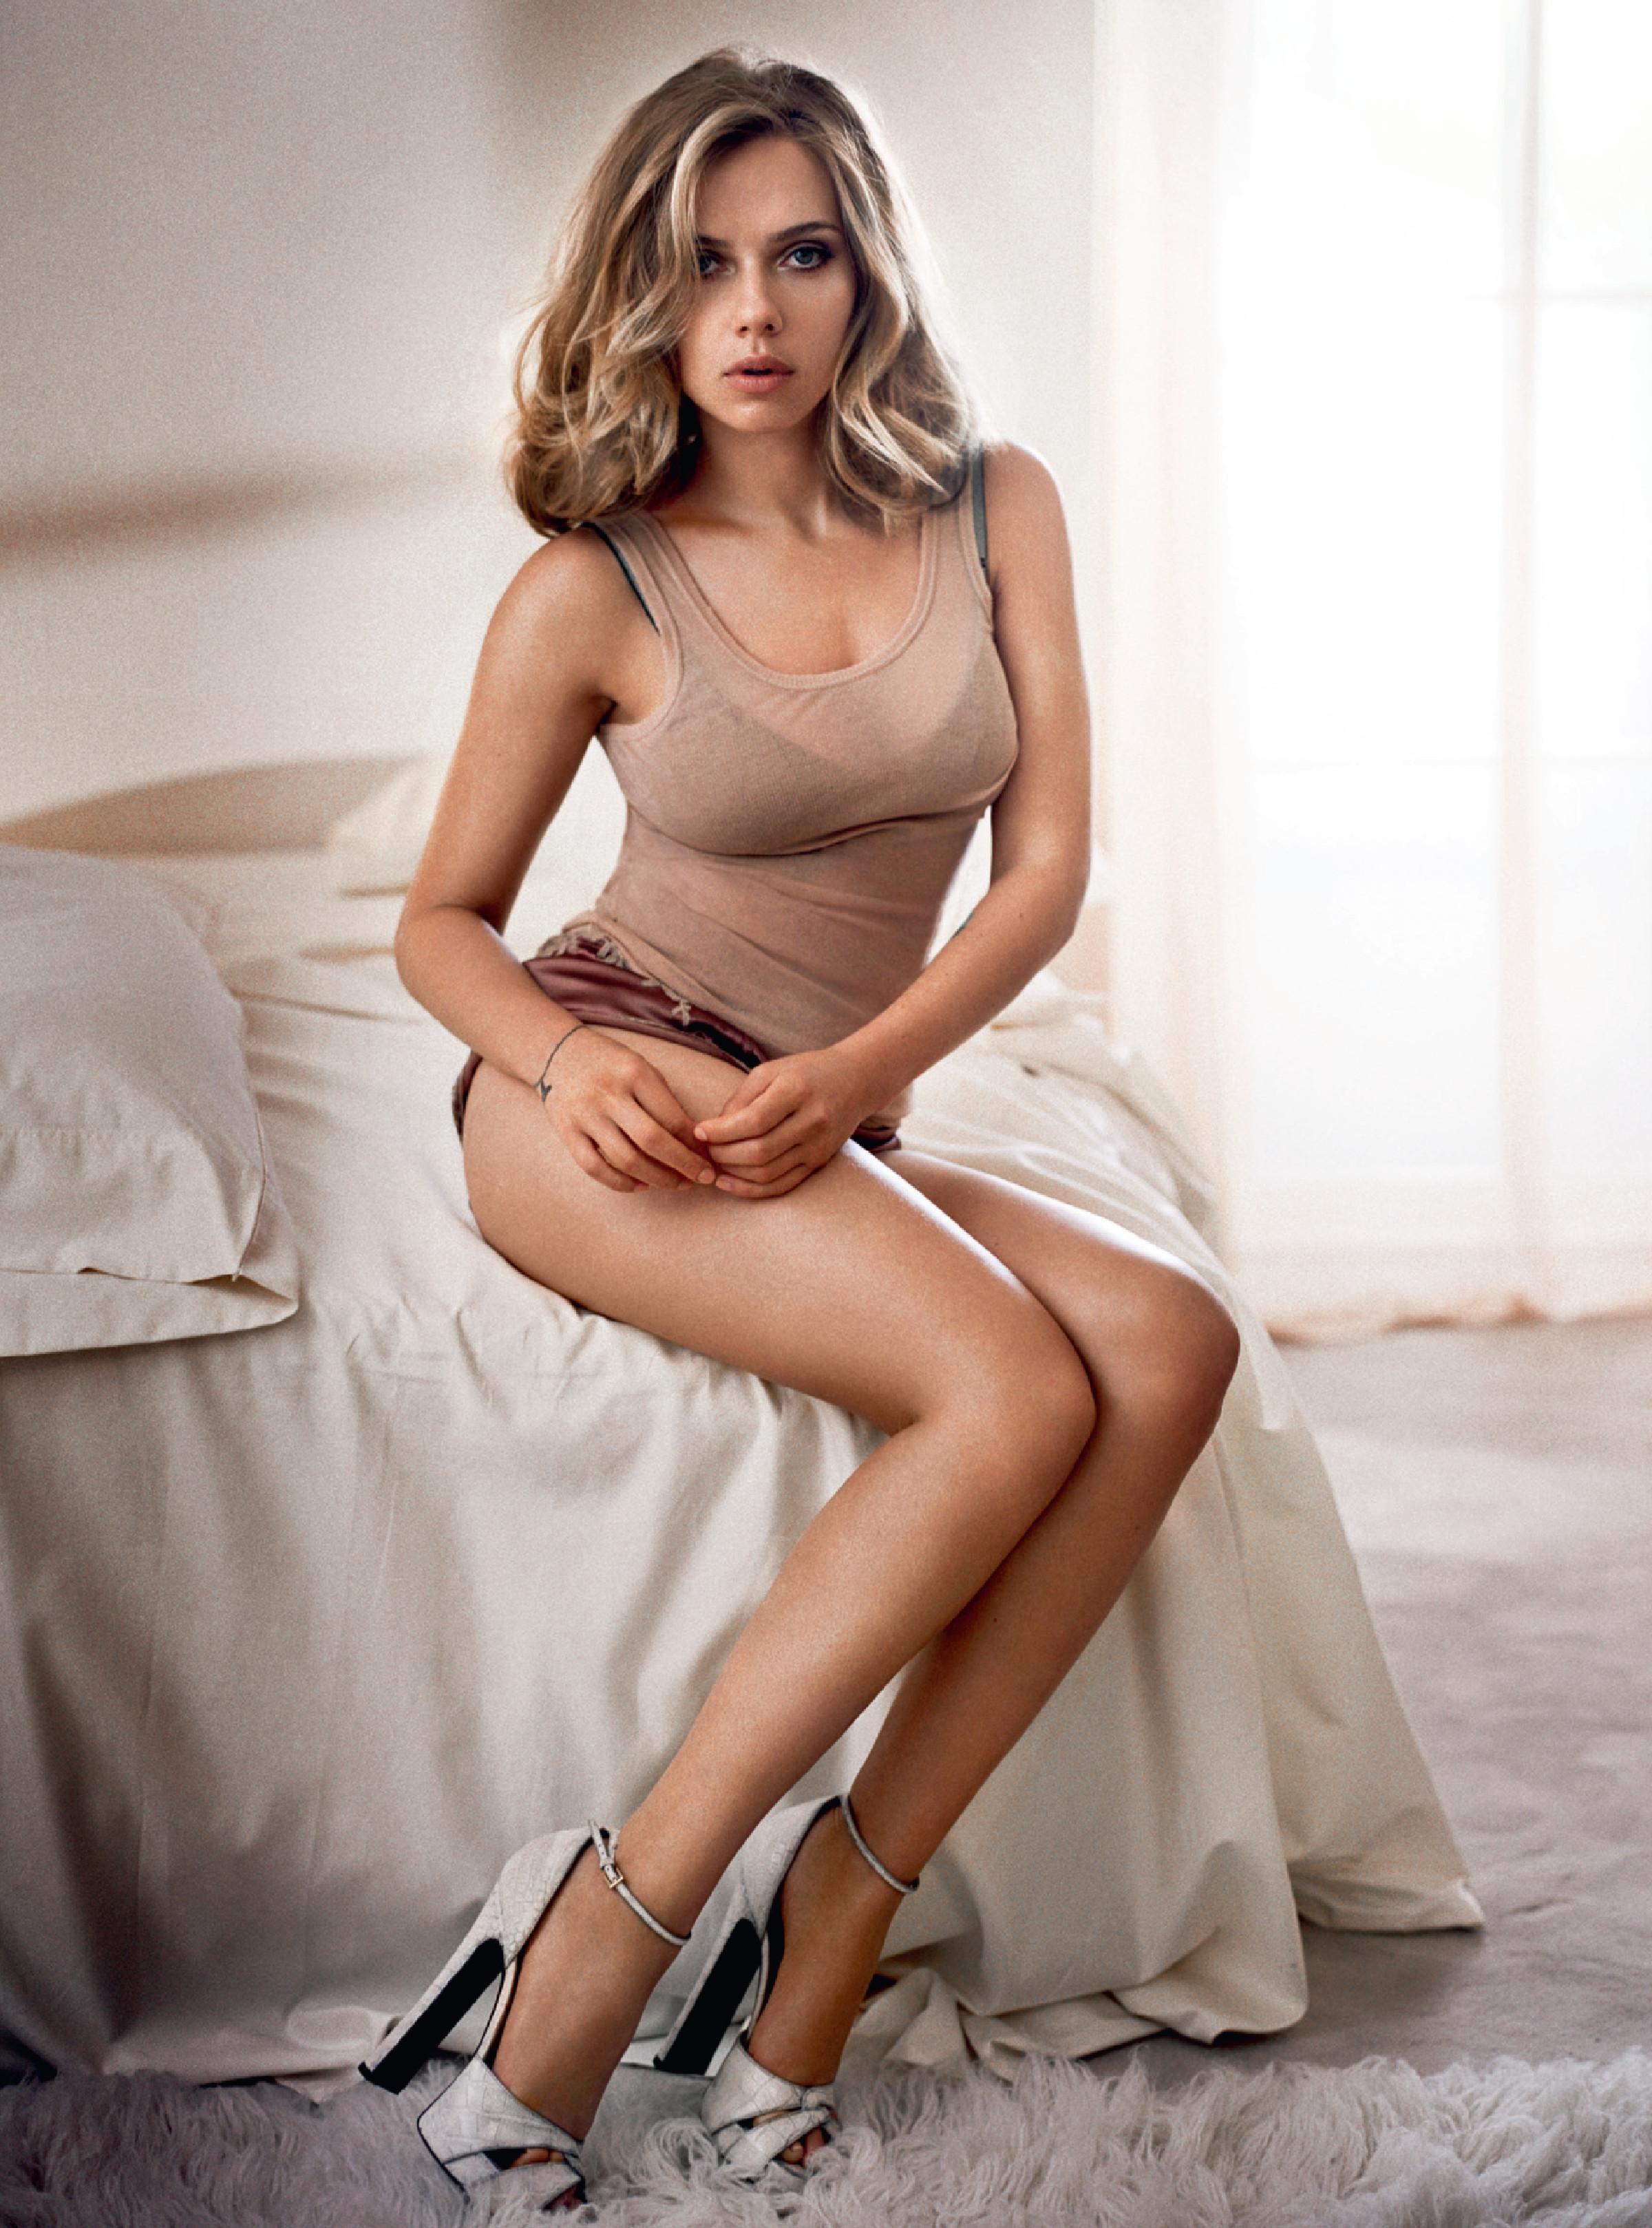 Scarlett Johansson's Feet Scarlett